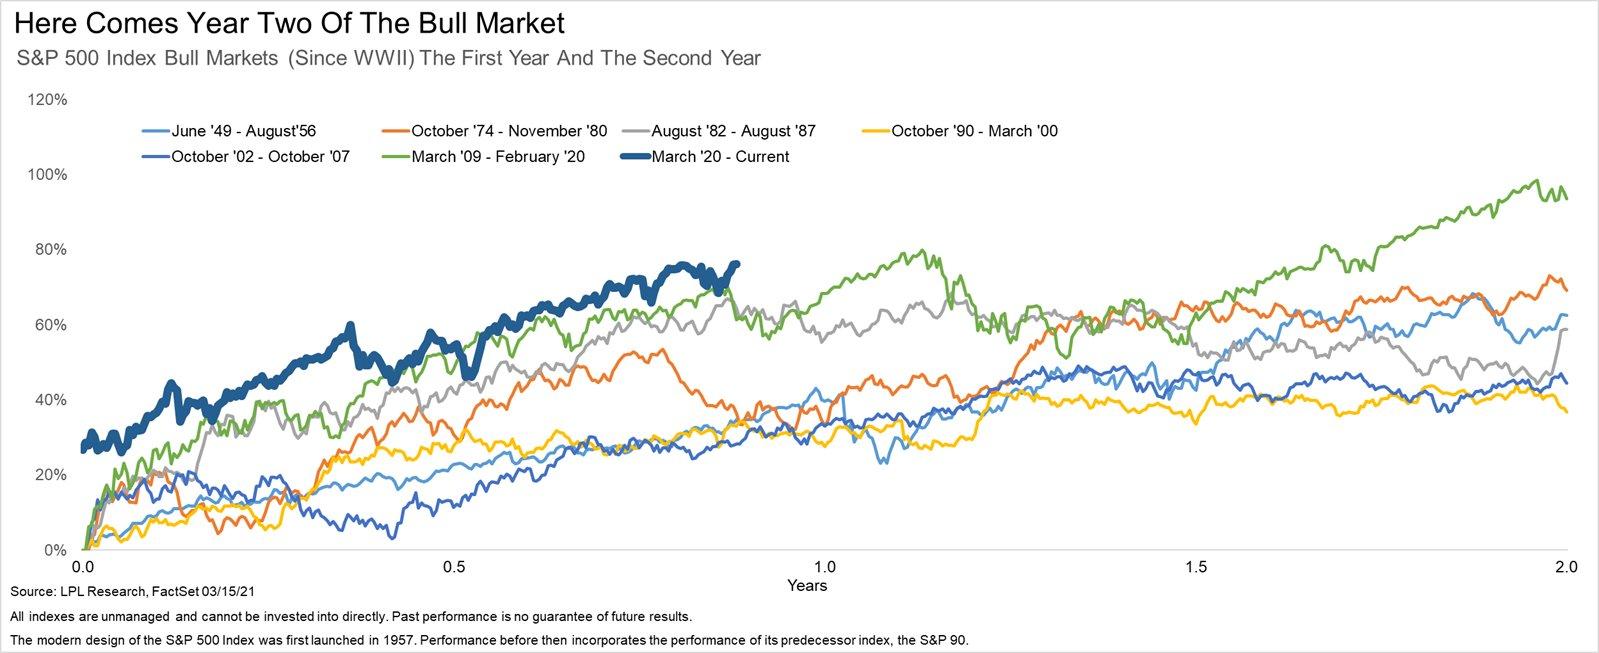 Bull market: round 2